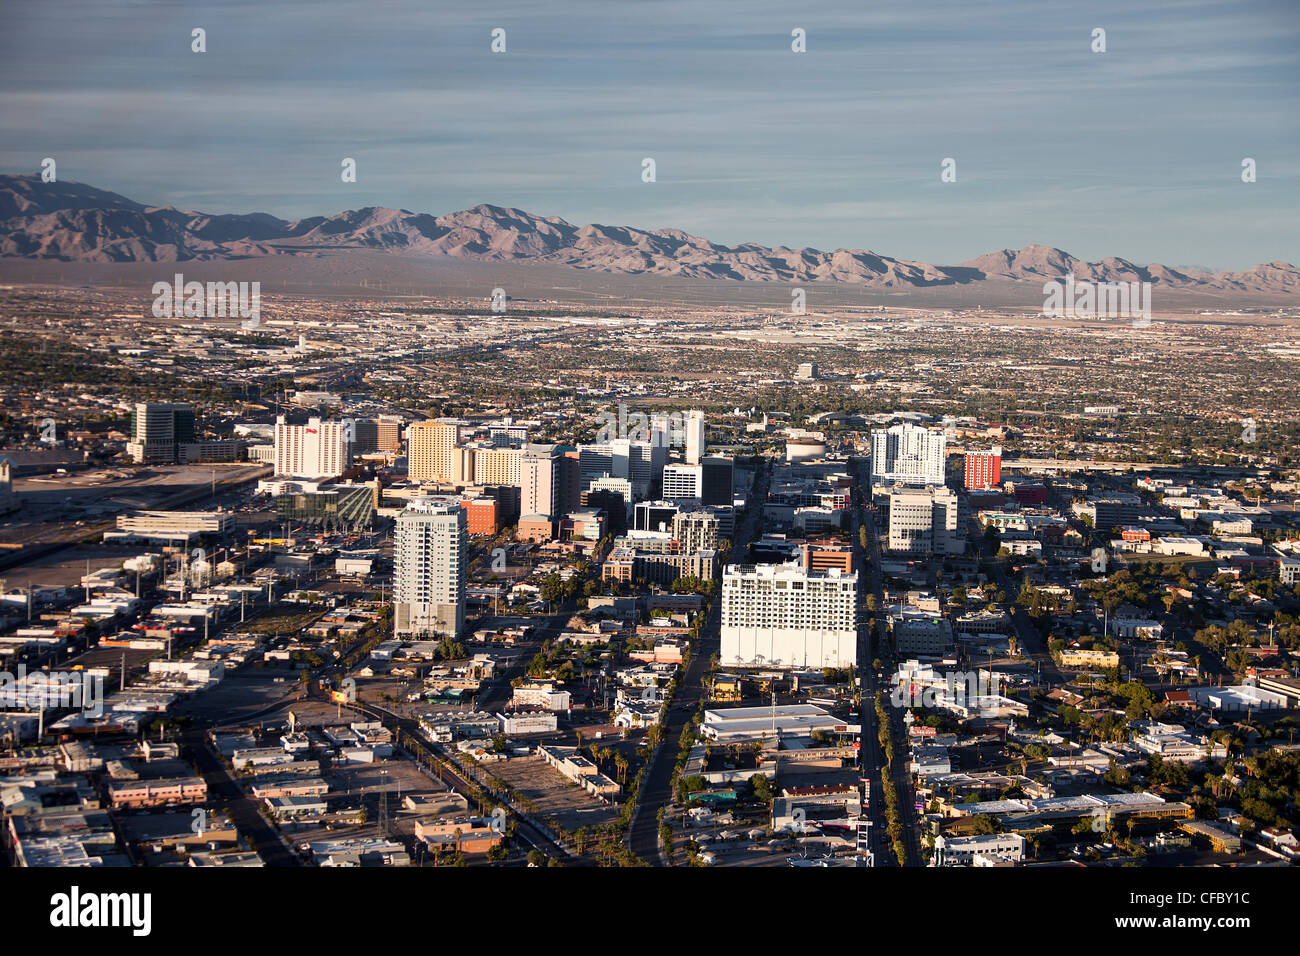 USA, USA, Amerika, Nevada, Las Vegas, Stadt, Innenstadt, aerial View, trocken, flach, alte Stadt, alte Vegas, Tourismus, Stockbild